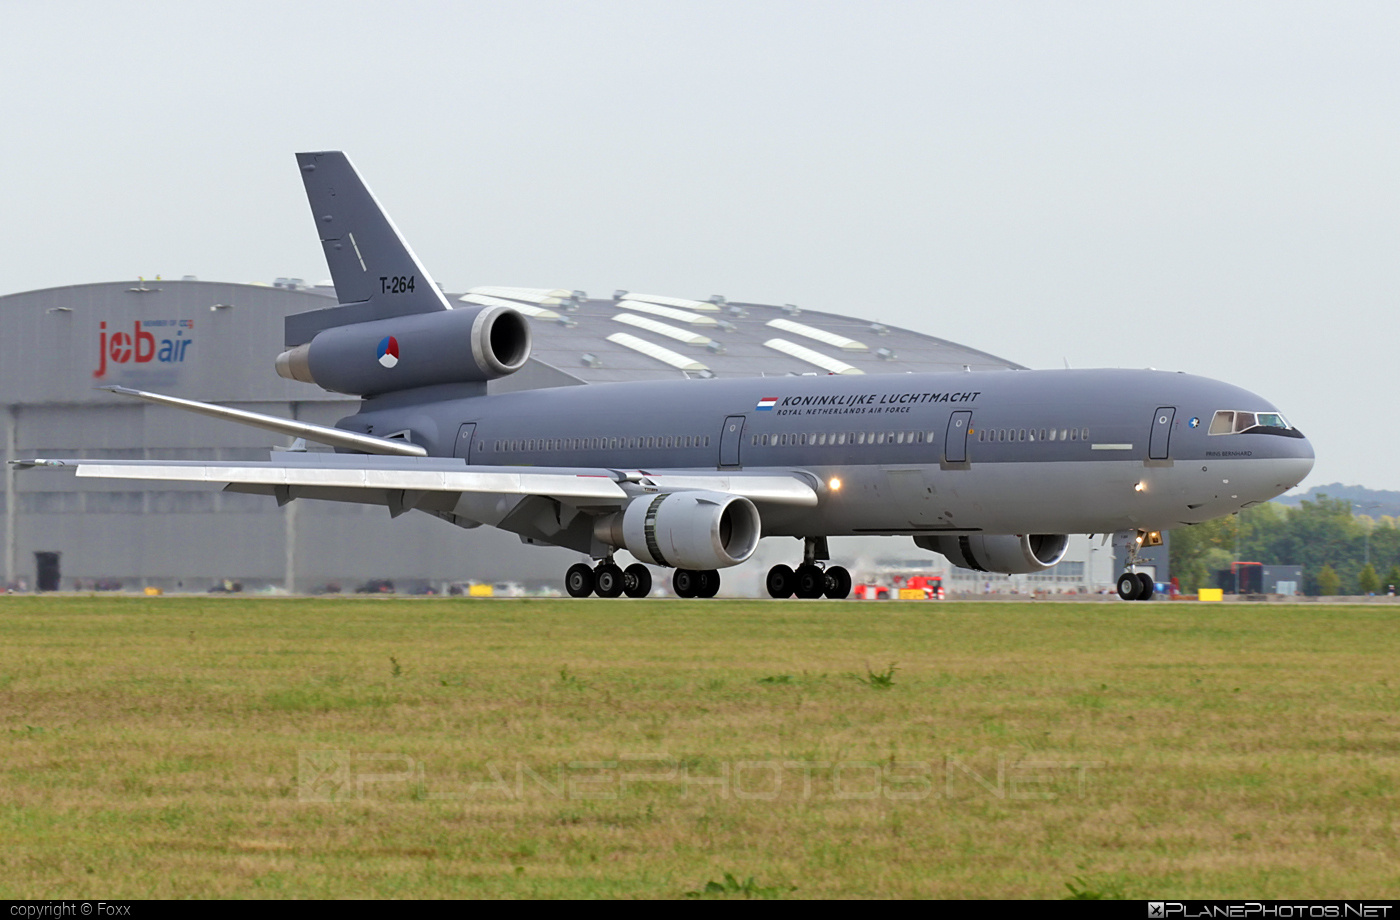 McDonnell Douglas KDC-10 - T-264 operated by Koninklijke Luchtmacht (Royal Netherlands Air Force) #dc10 #kdc10 #koninklijkeluchtmacht #mcdonnelldouglas #natodays #natodays2015 #royalnetherlandsairforce